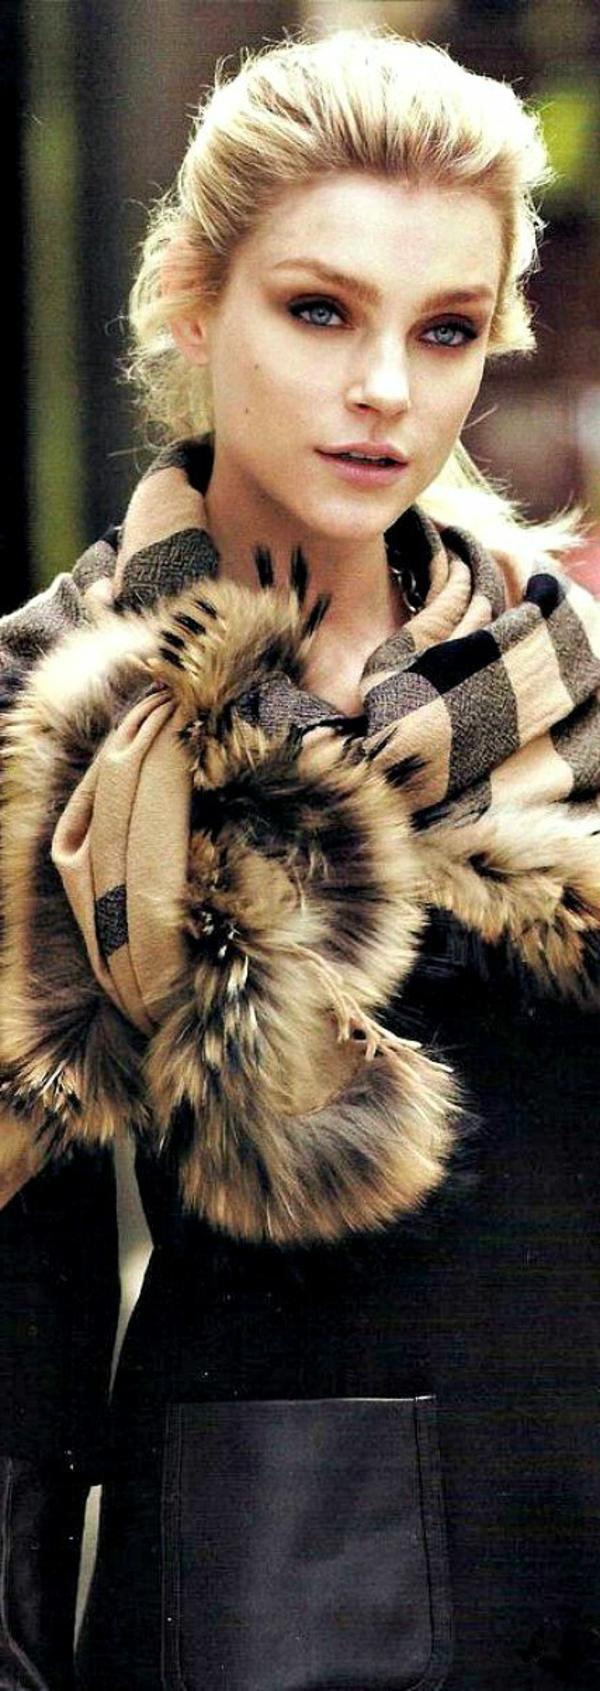 porter-burberry-écharpe-tenue-furrure